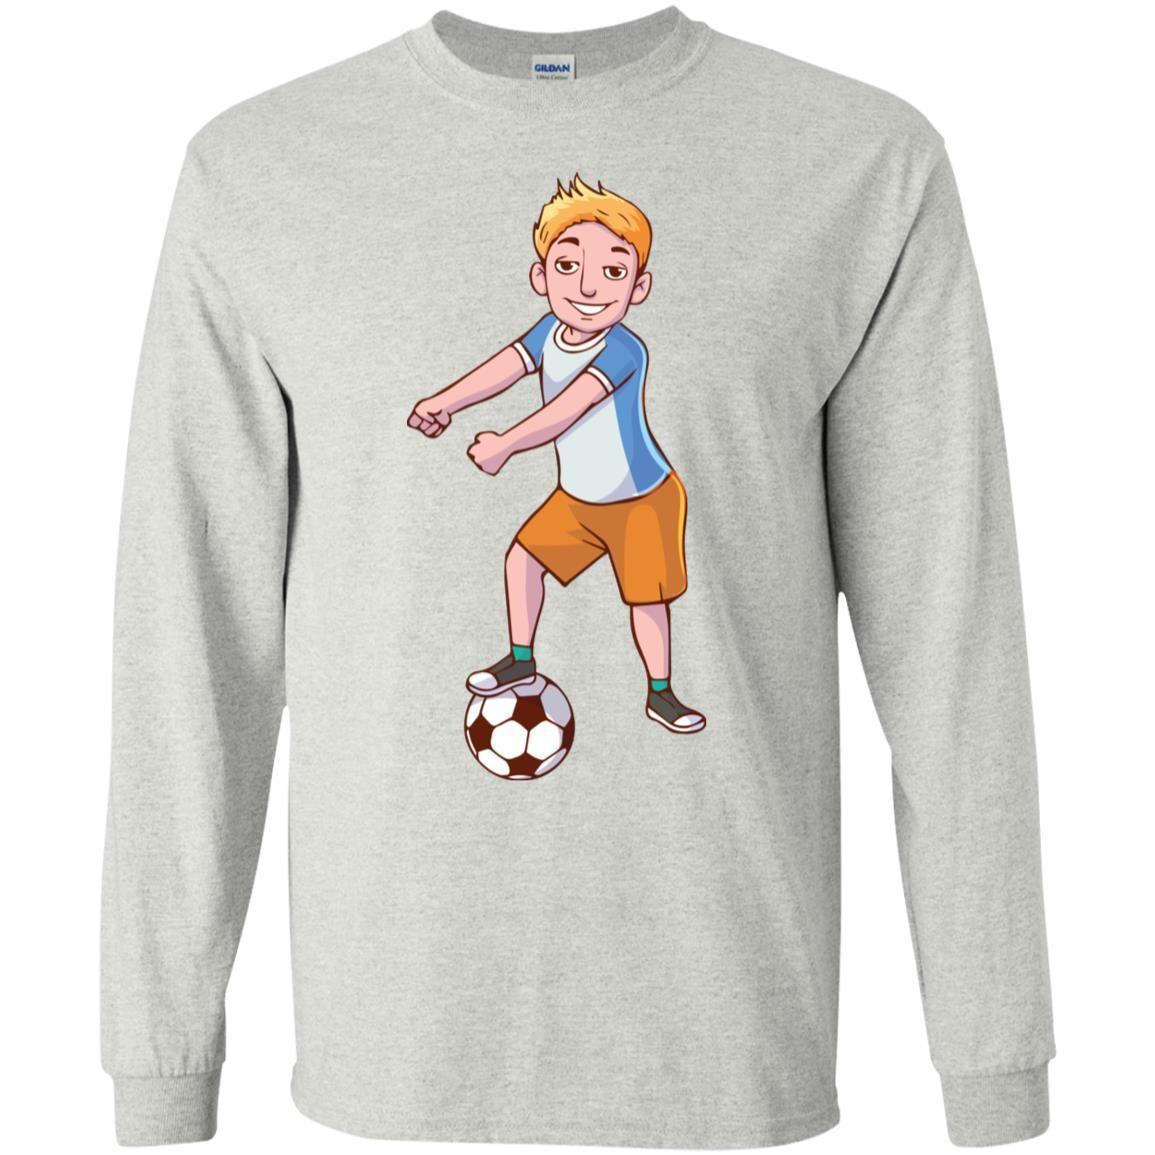 Floss Like A Boss Soccer Long Sleeve T Shirt Boys Girls Men Women Kids Youth Guys And Girls Long Sleeve Tshirt Long Sleeve [ 1155 x 1155 Pixel ]